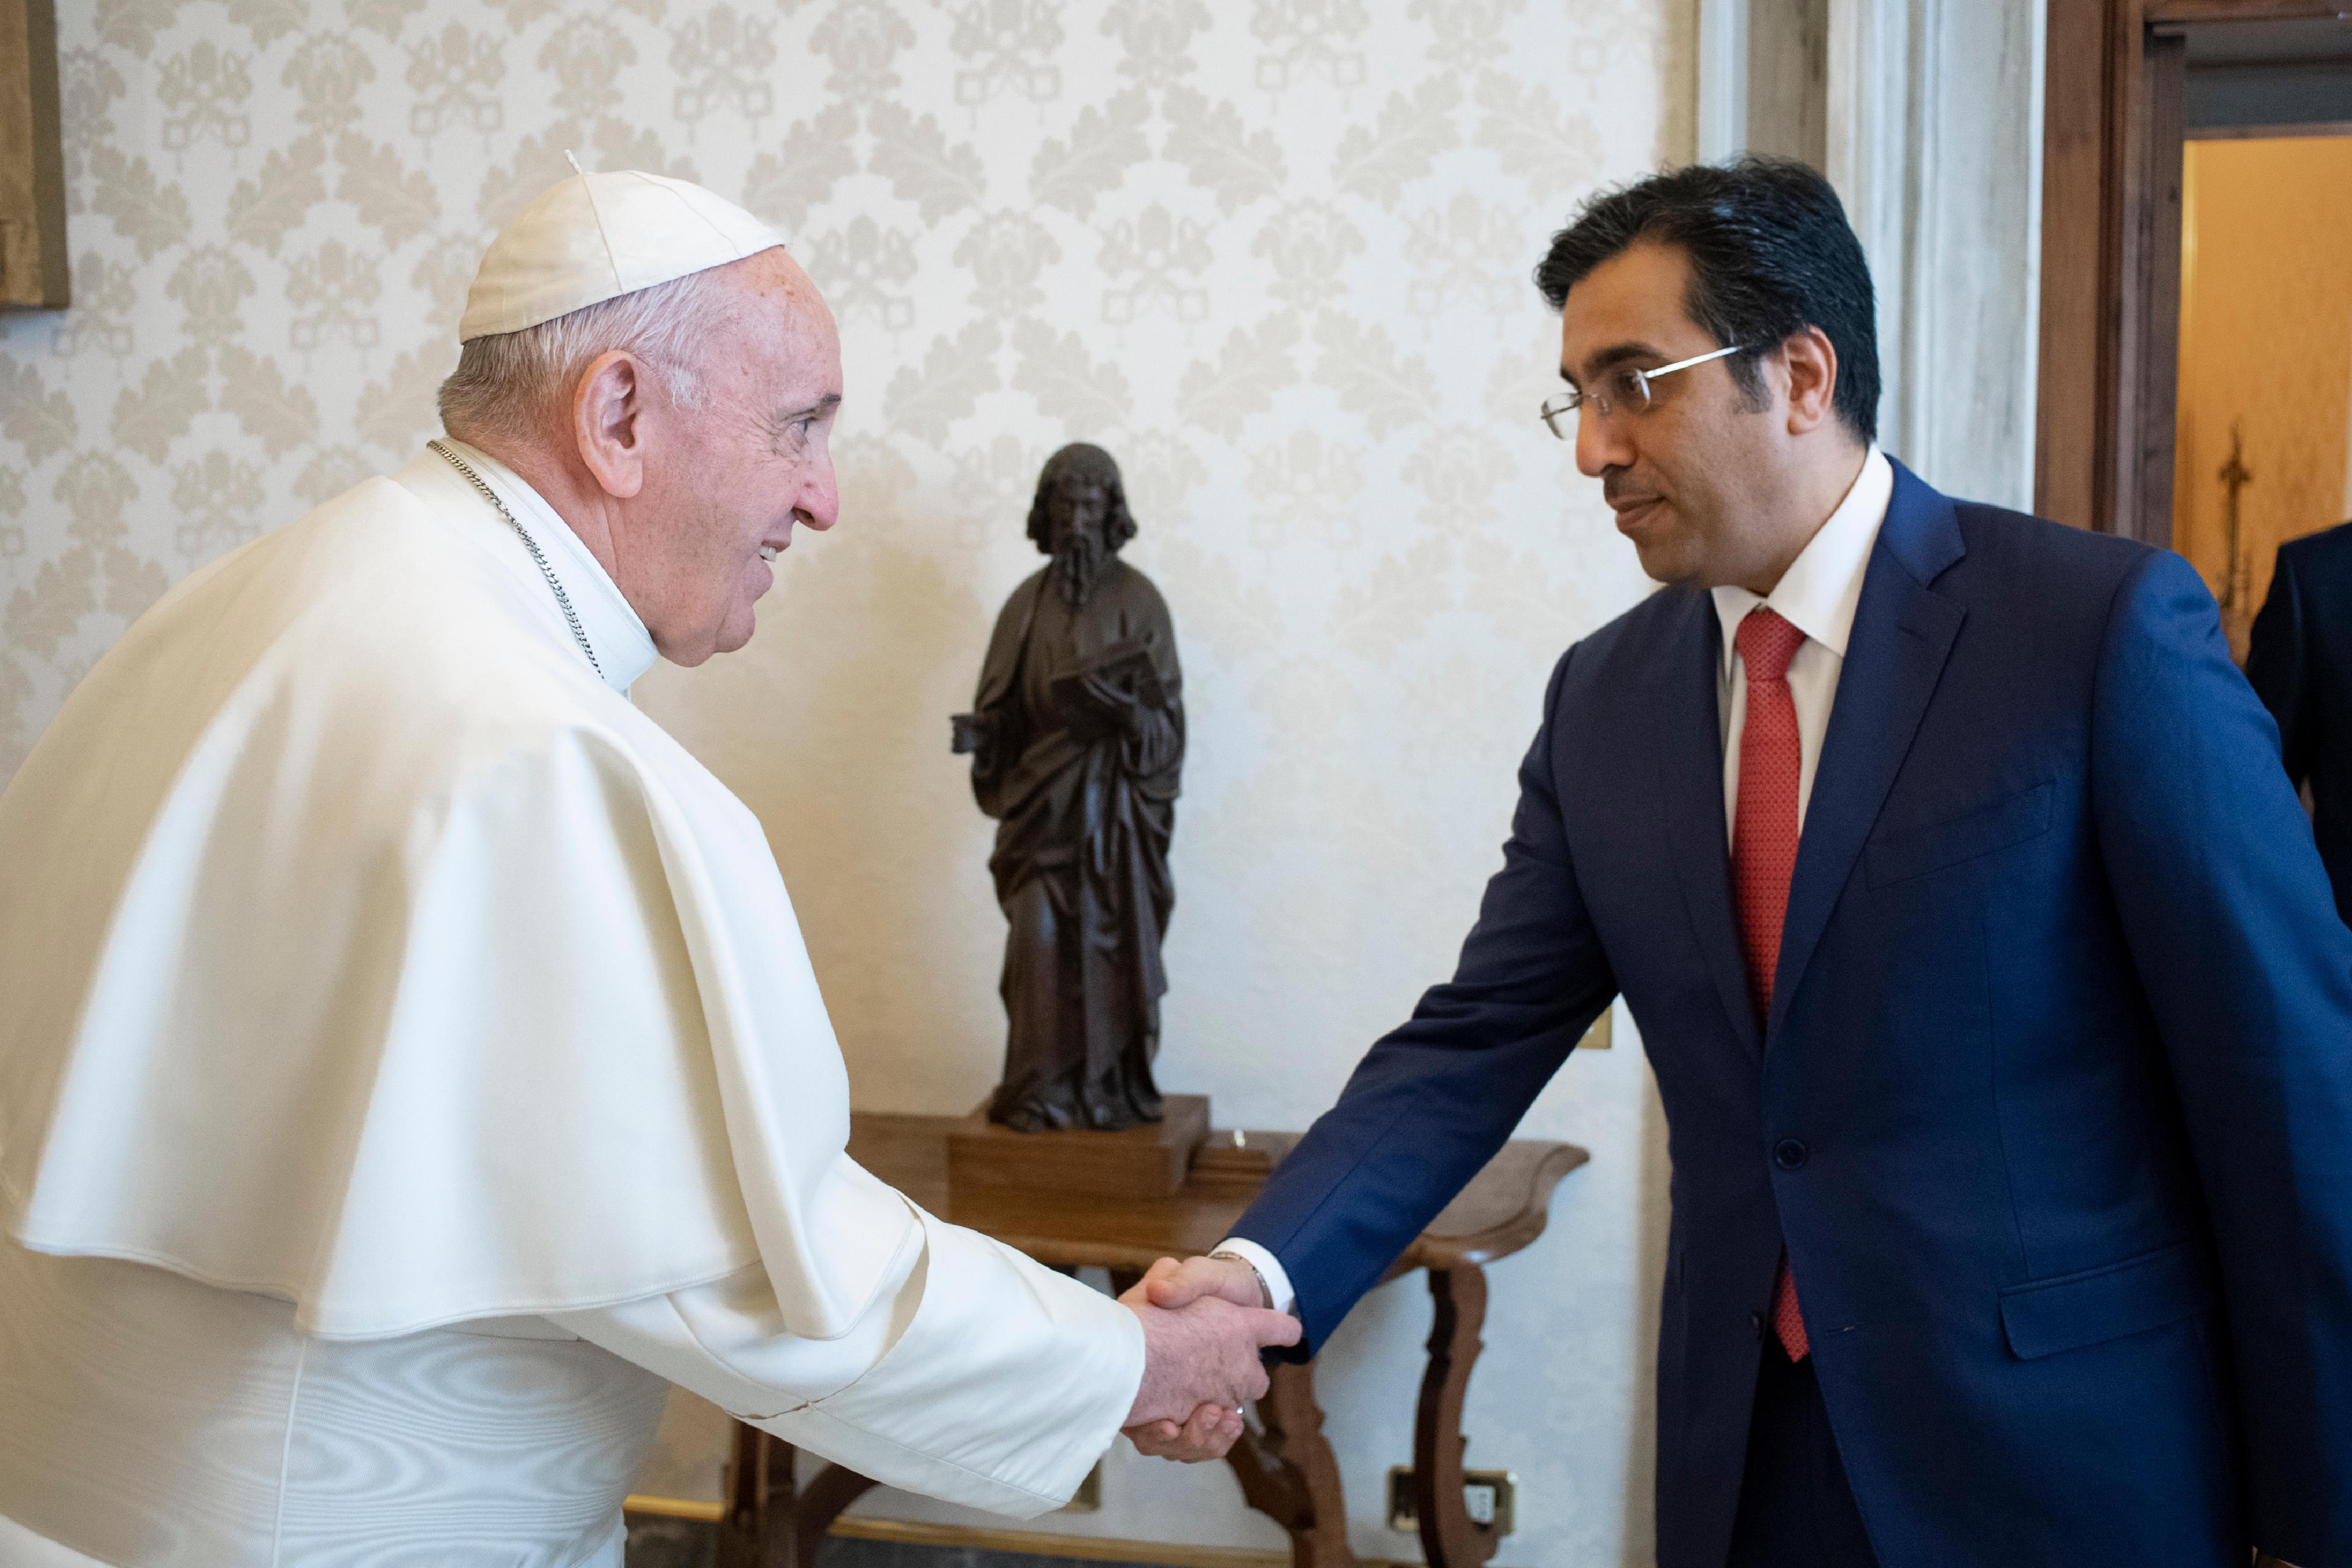 Ali Bin Smaikh Al Marri, président du NHRC, Qatar © Vatican Media